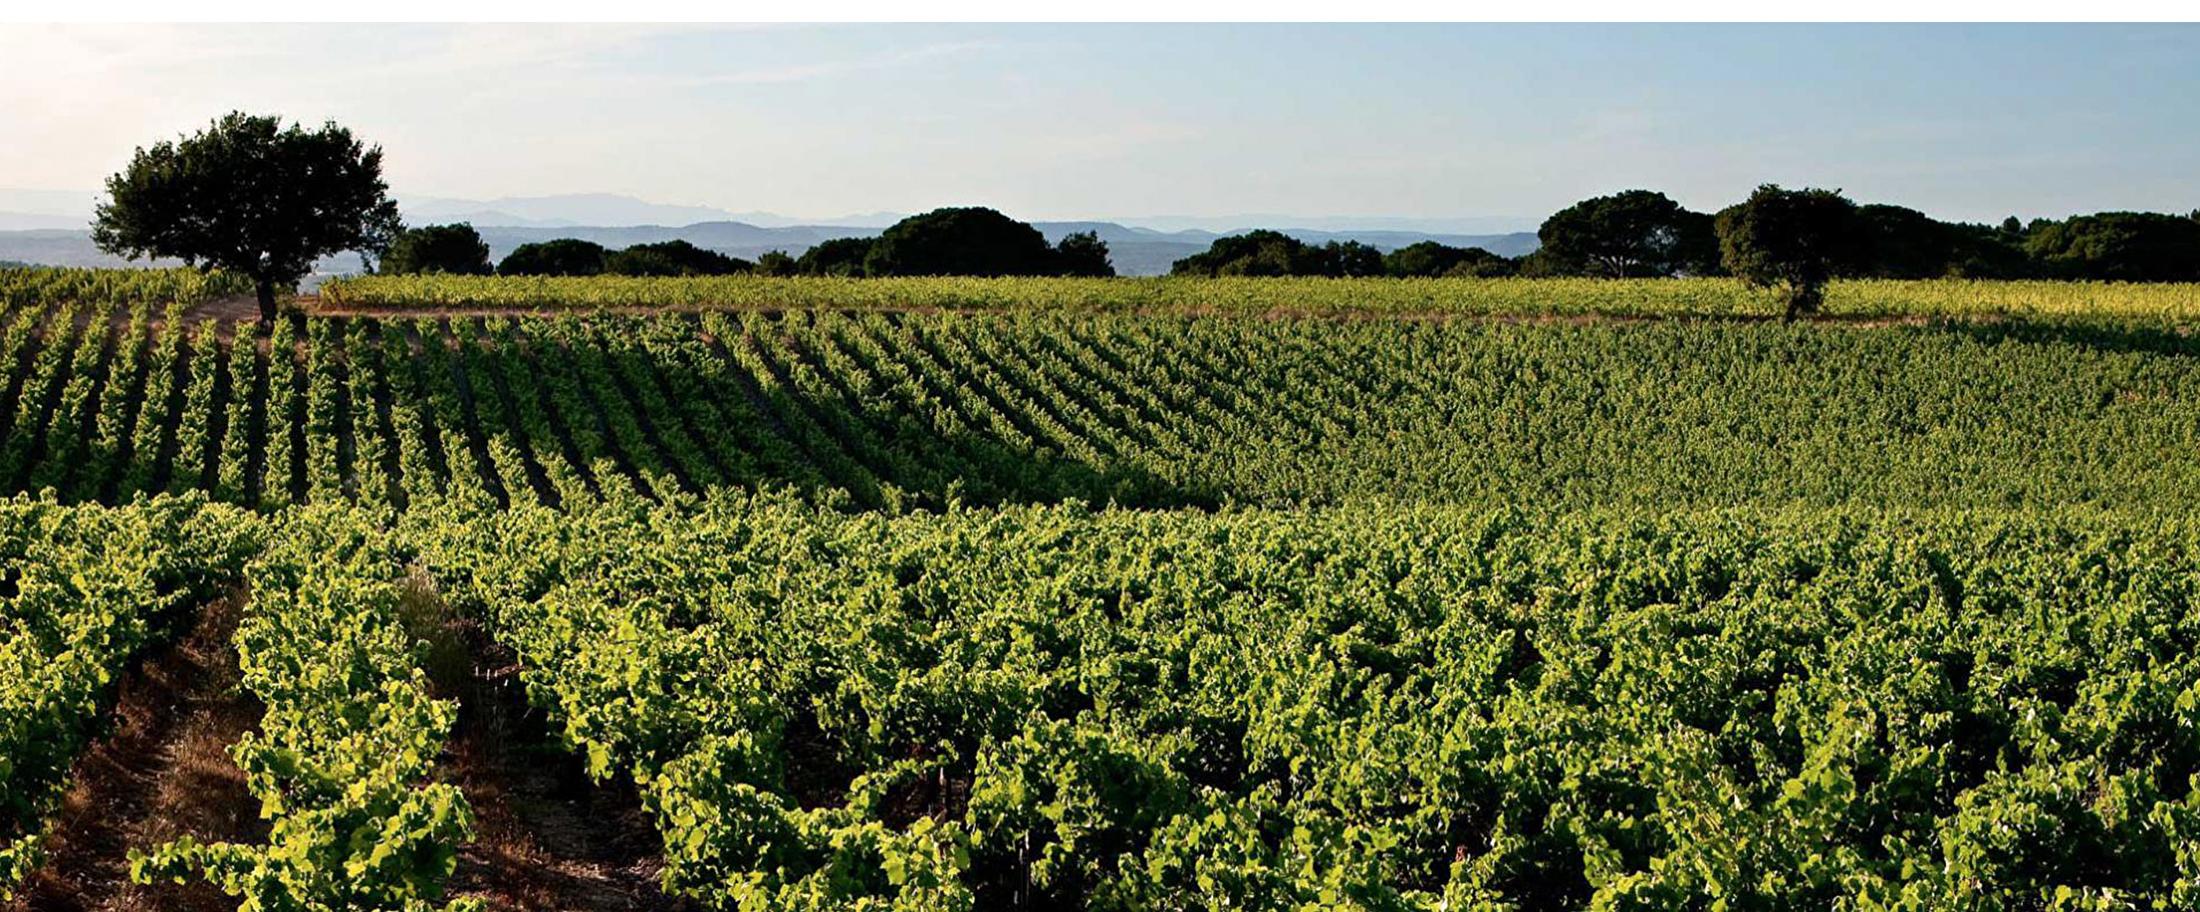 Vino Linea Directa_wijnregio